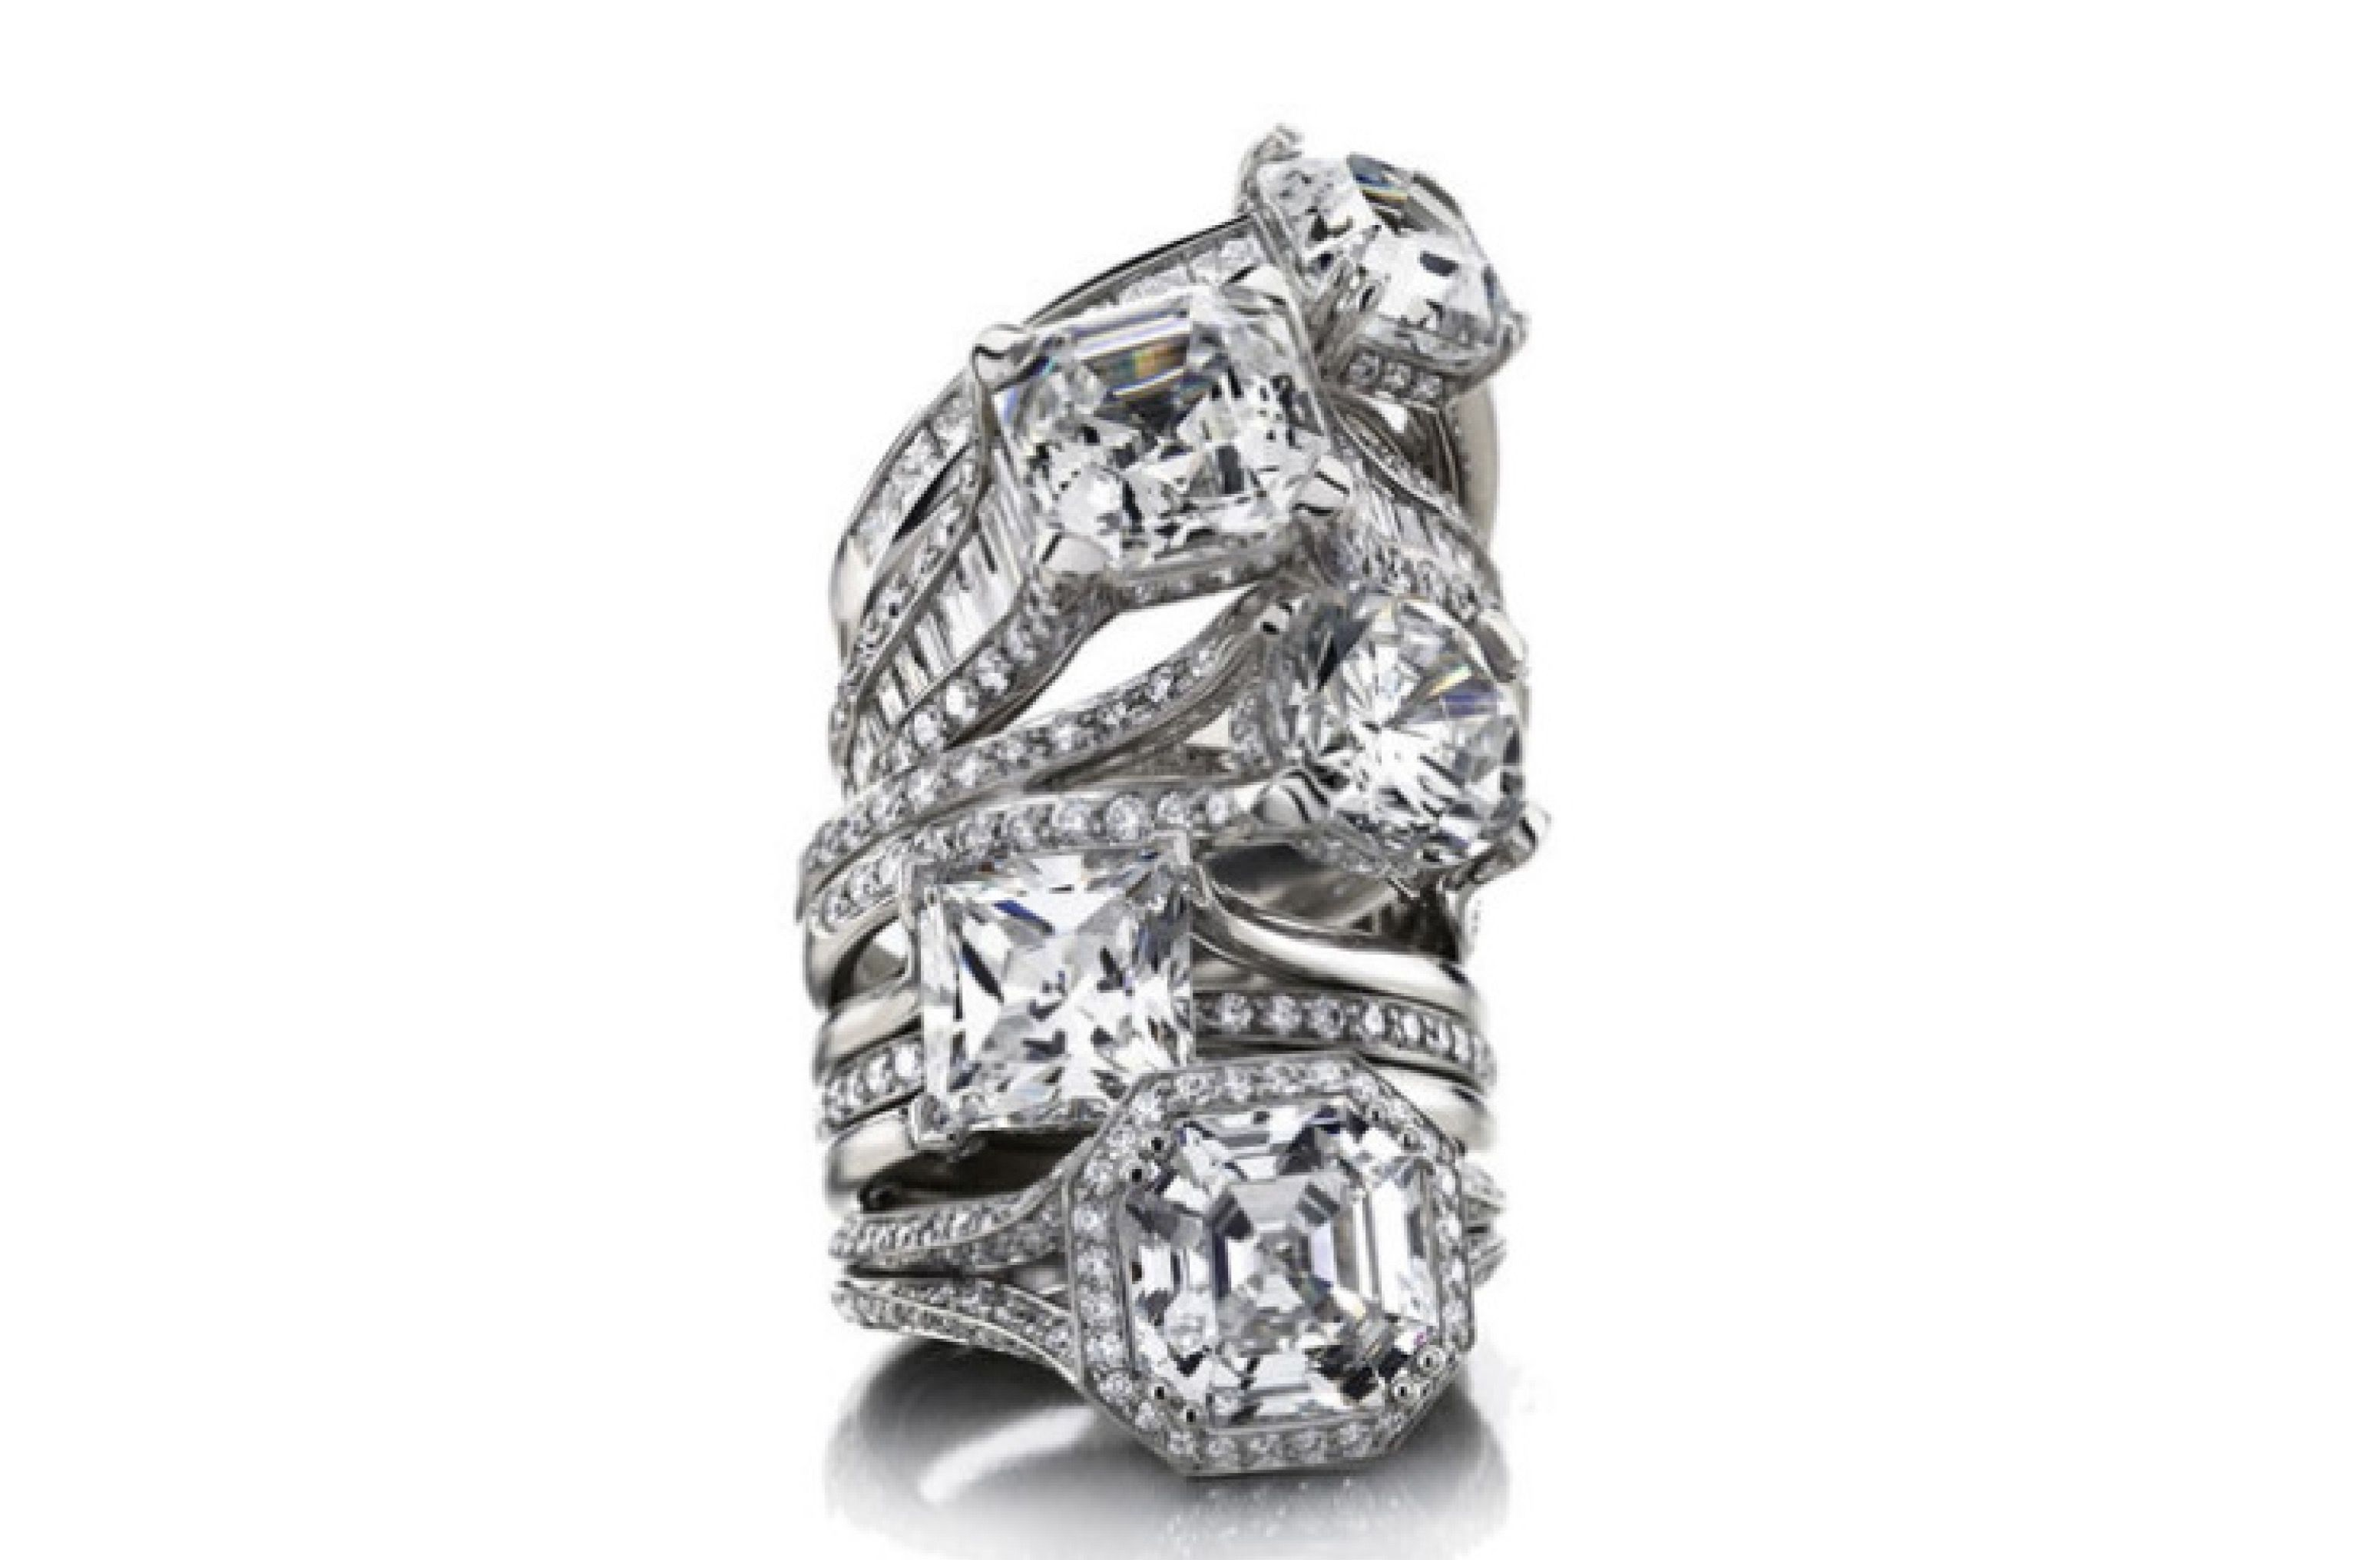 JewelryWhite_29.jpg